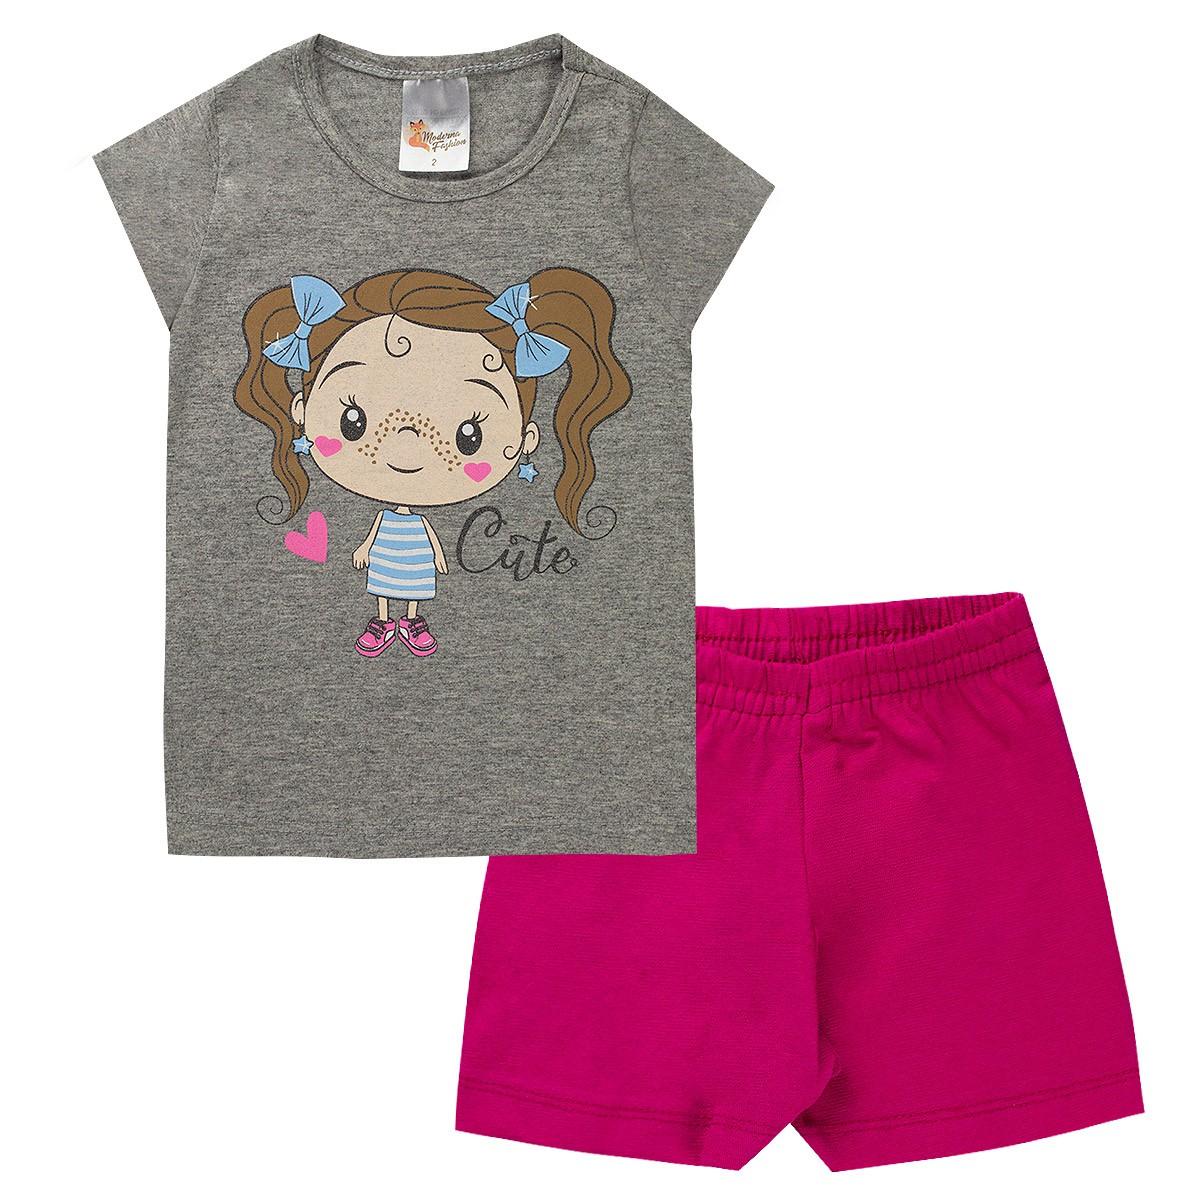 Kit 5 Conjuntos Infantis Menina Cotton Verão Feminino